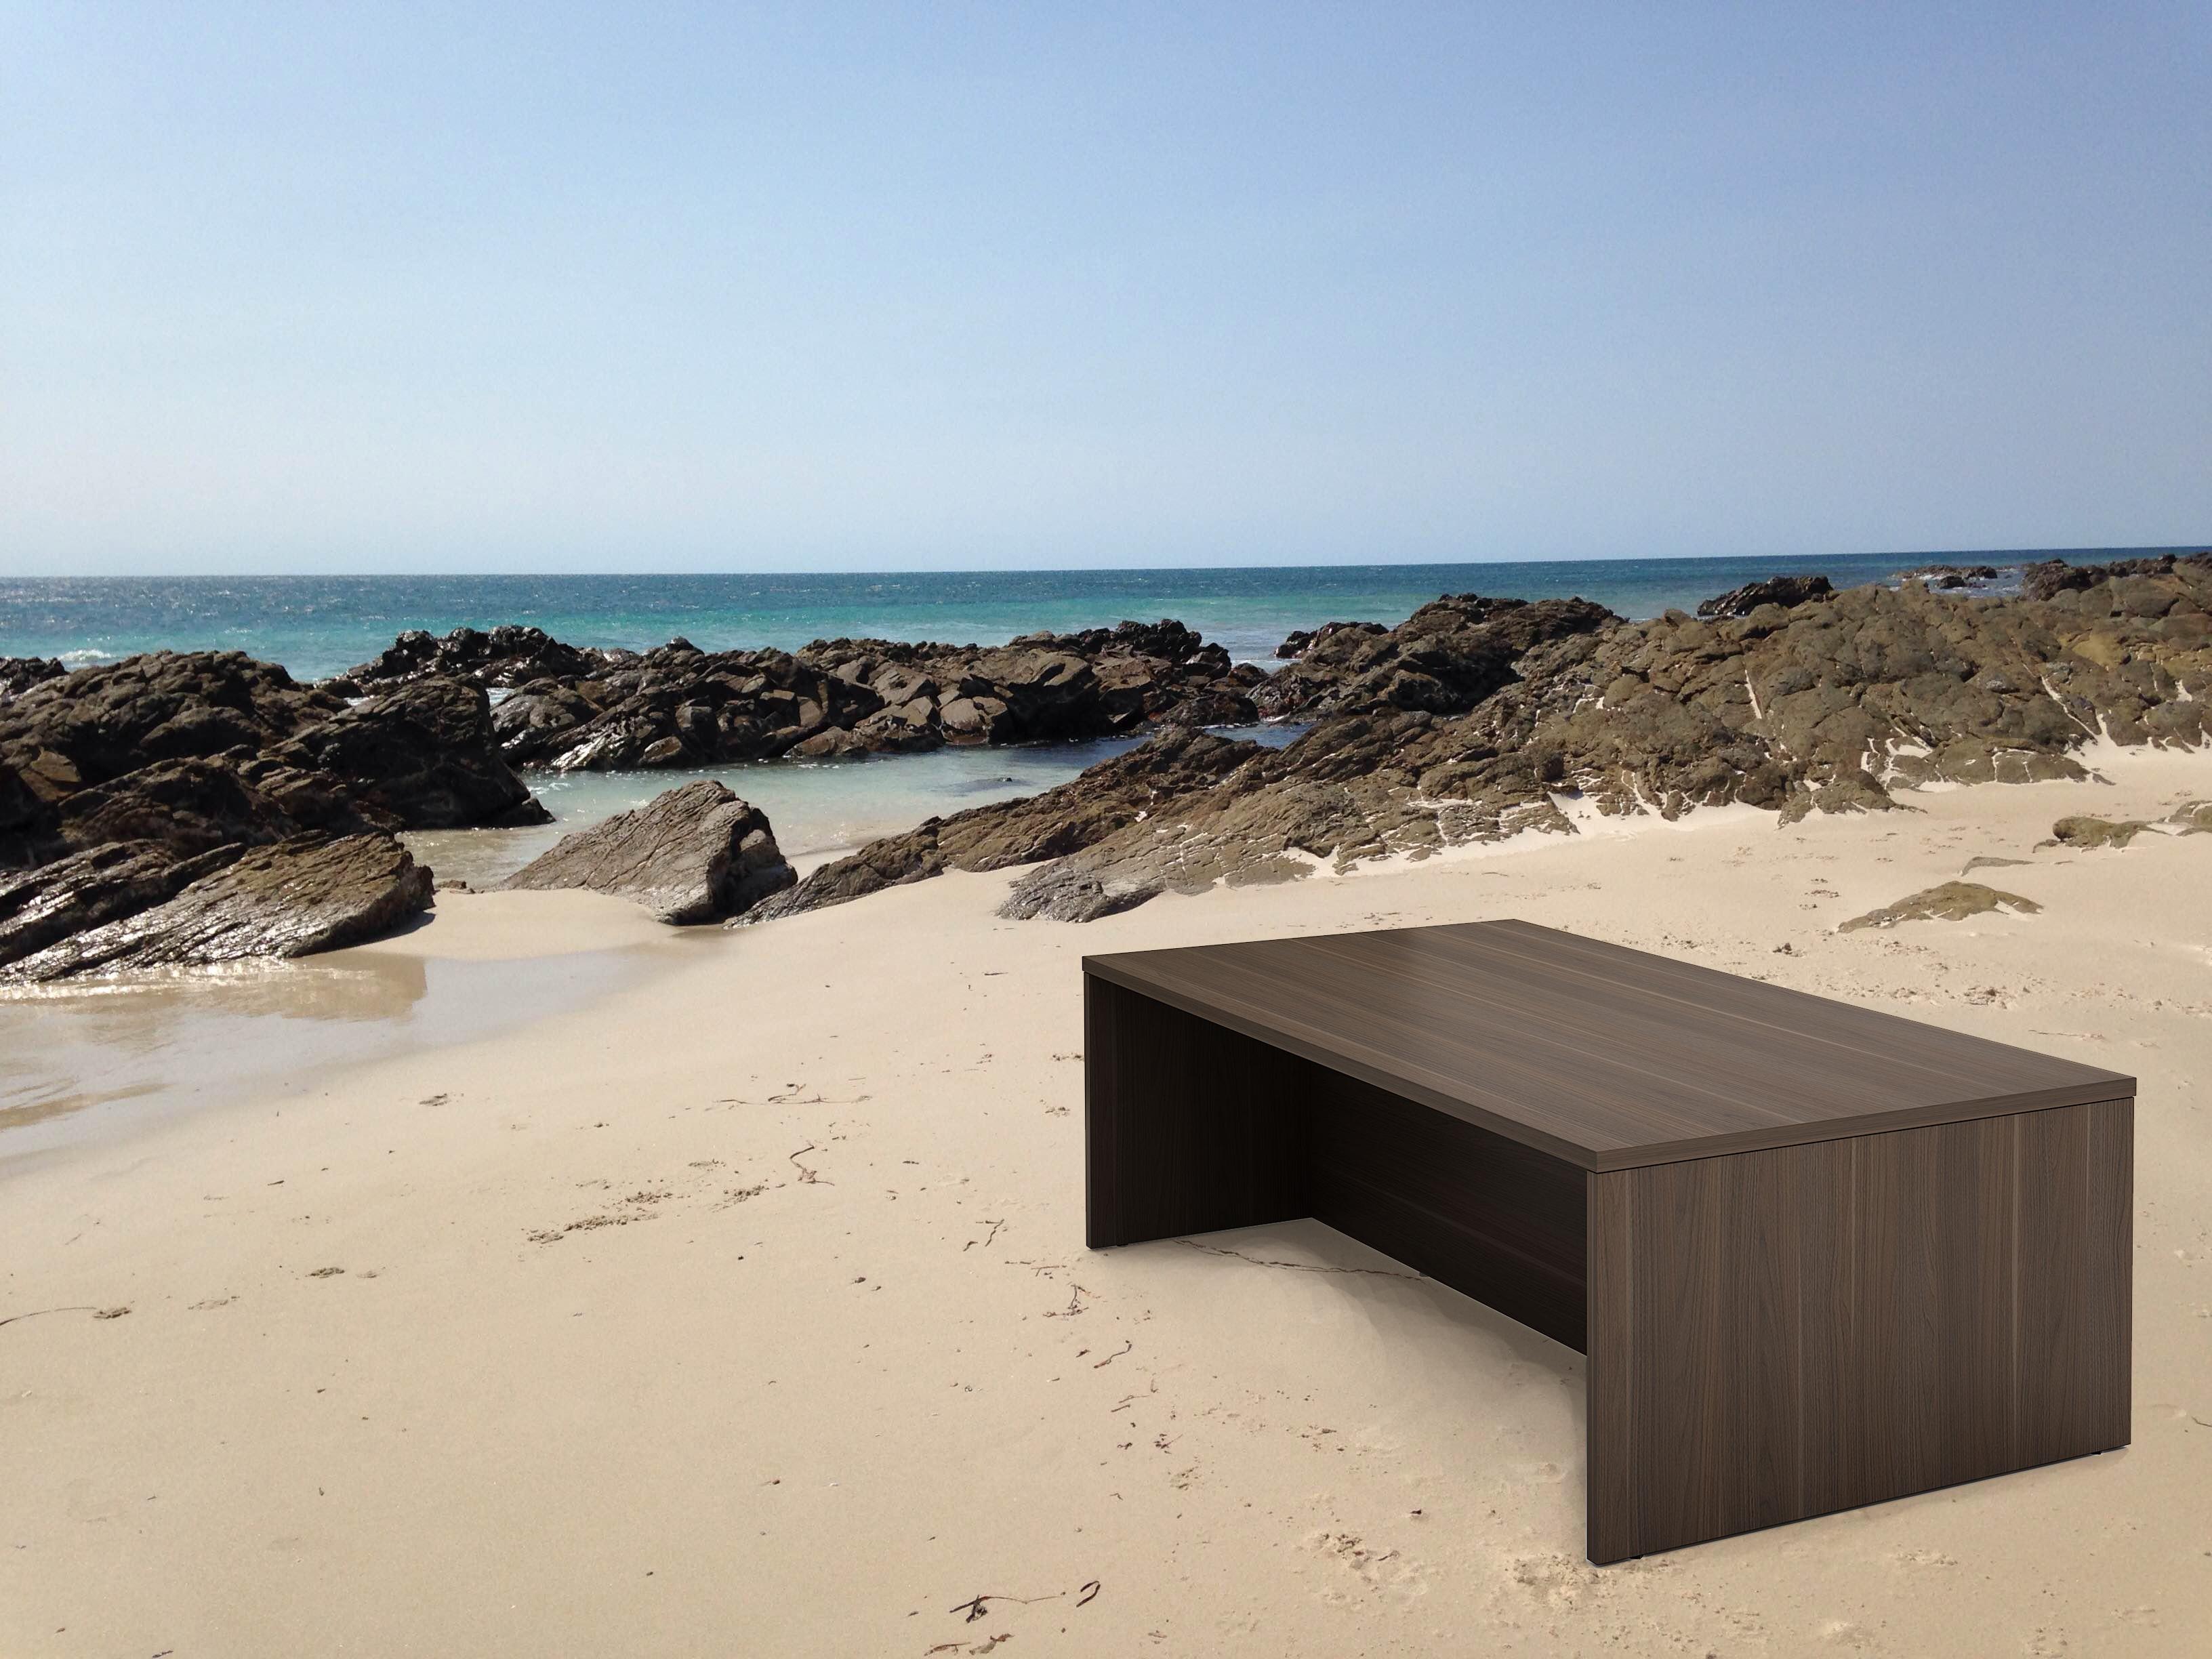 Deserted Island_Big Table 2